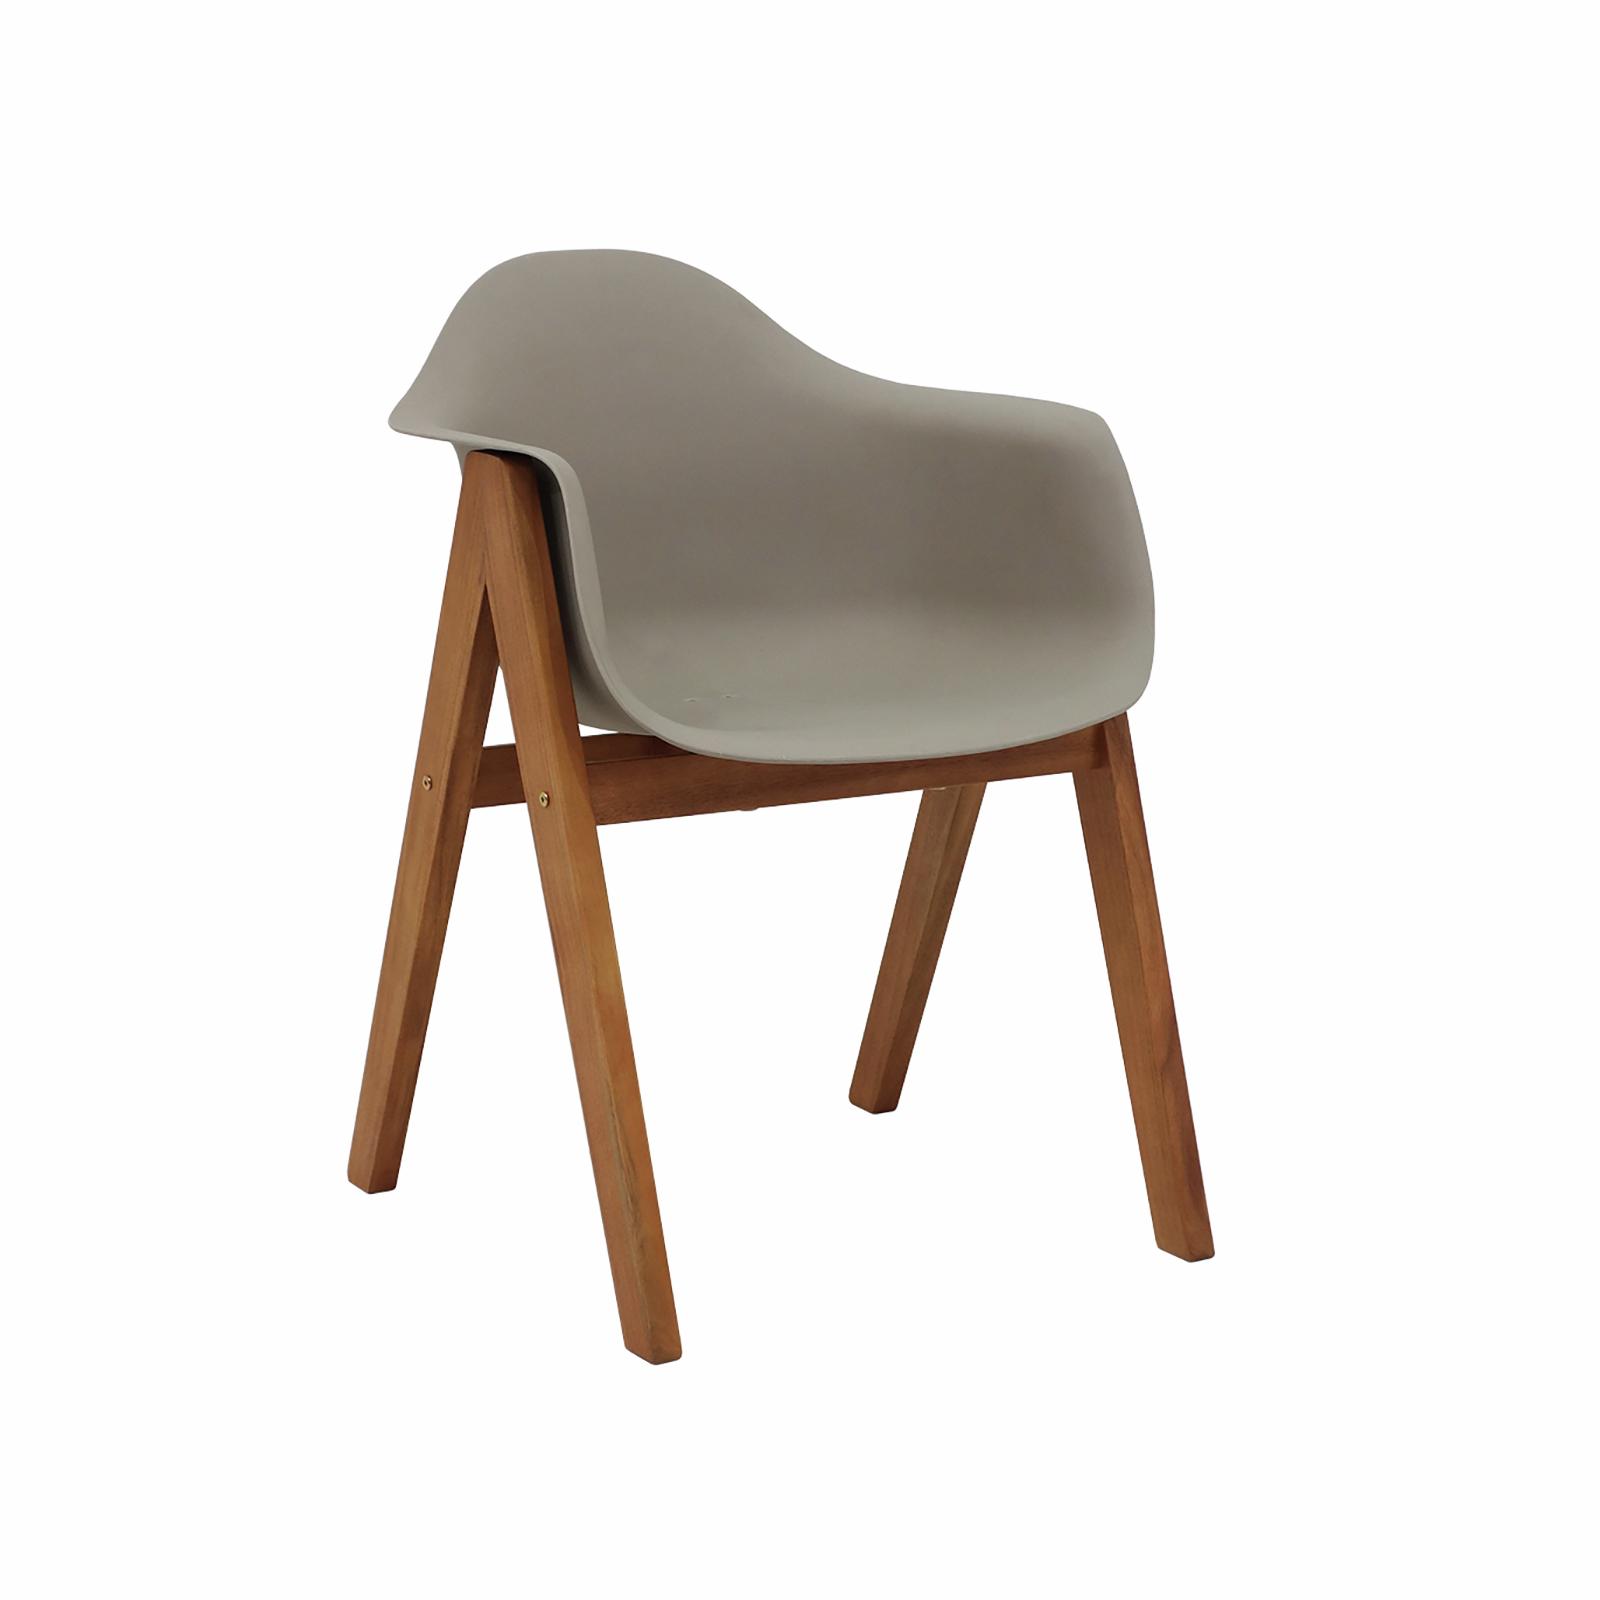 Hartman Delta Timber Dining Chair - Biscuit